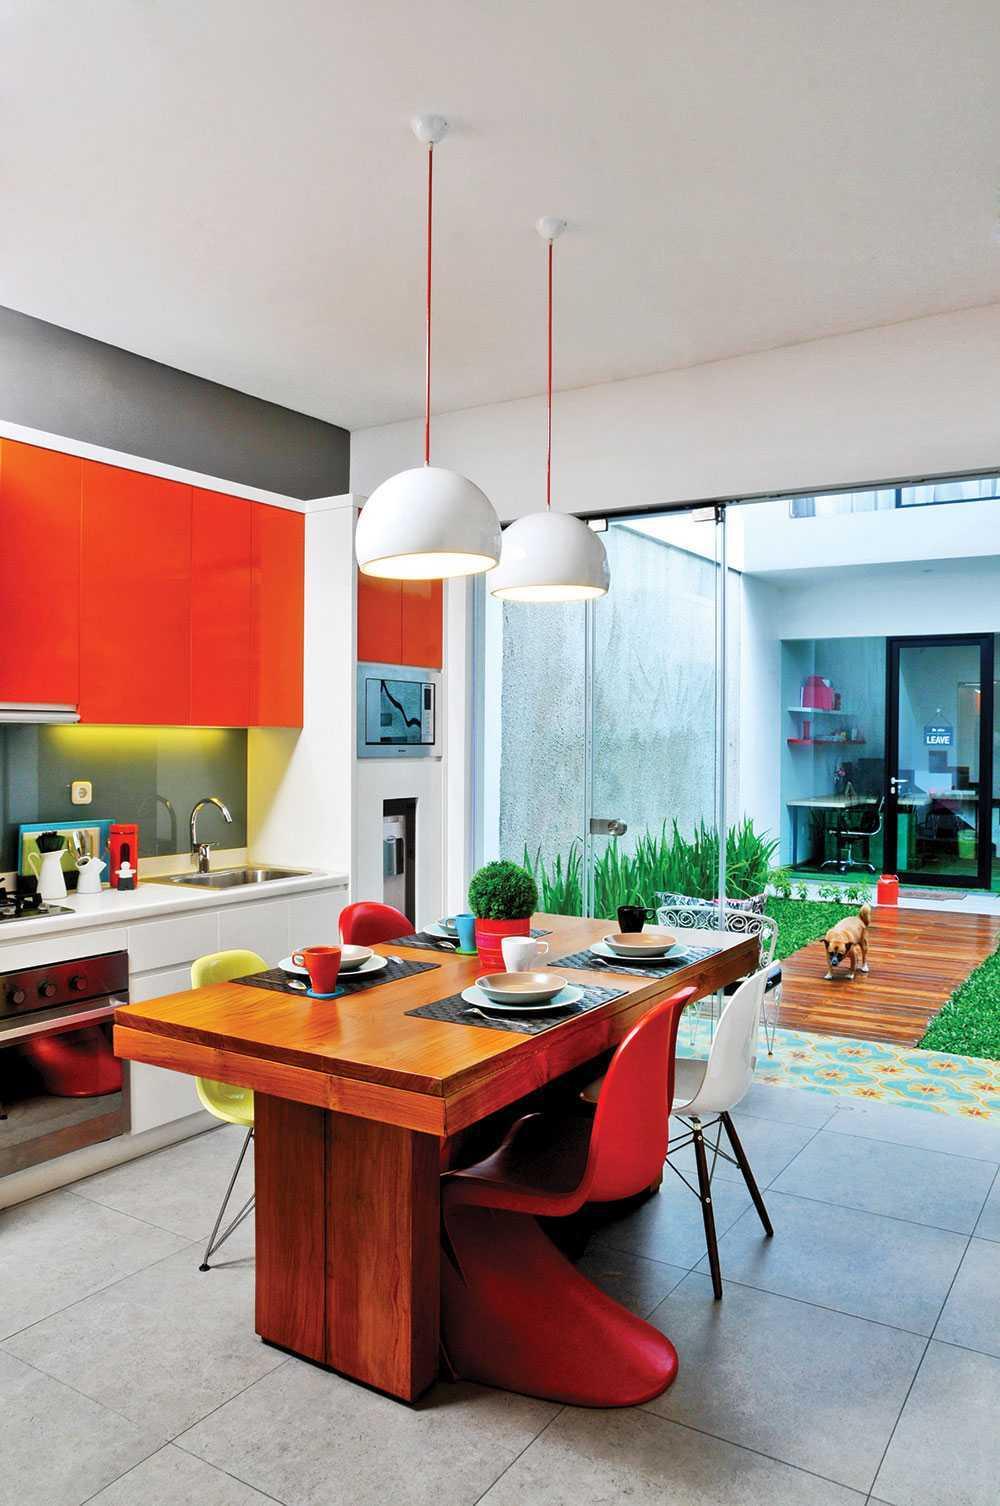 Vindo Design Urban Pop House Jakarta, Indonesia Jakarta, Indonesia Dining-Area Minimalis  9259